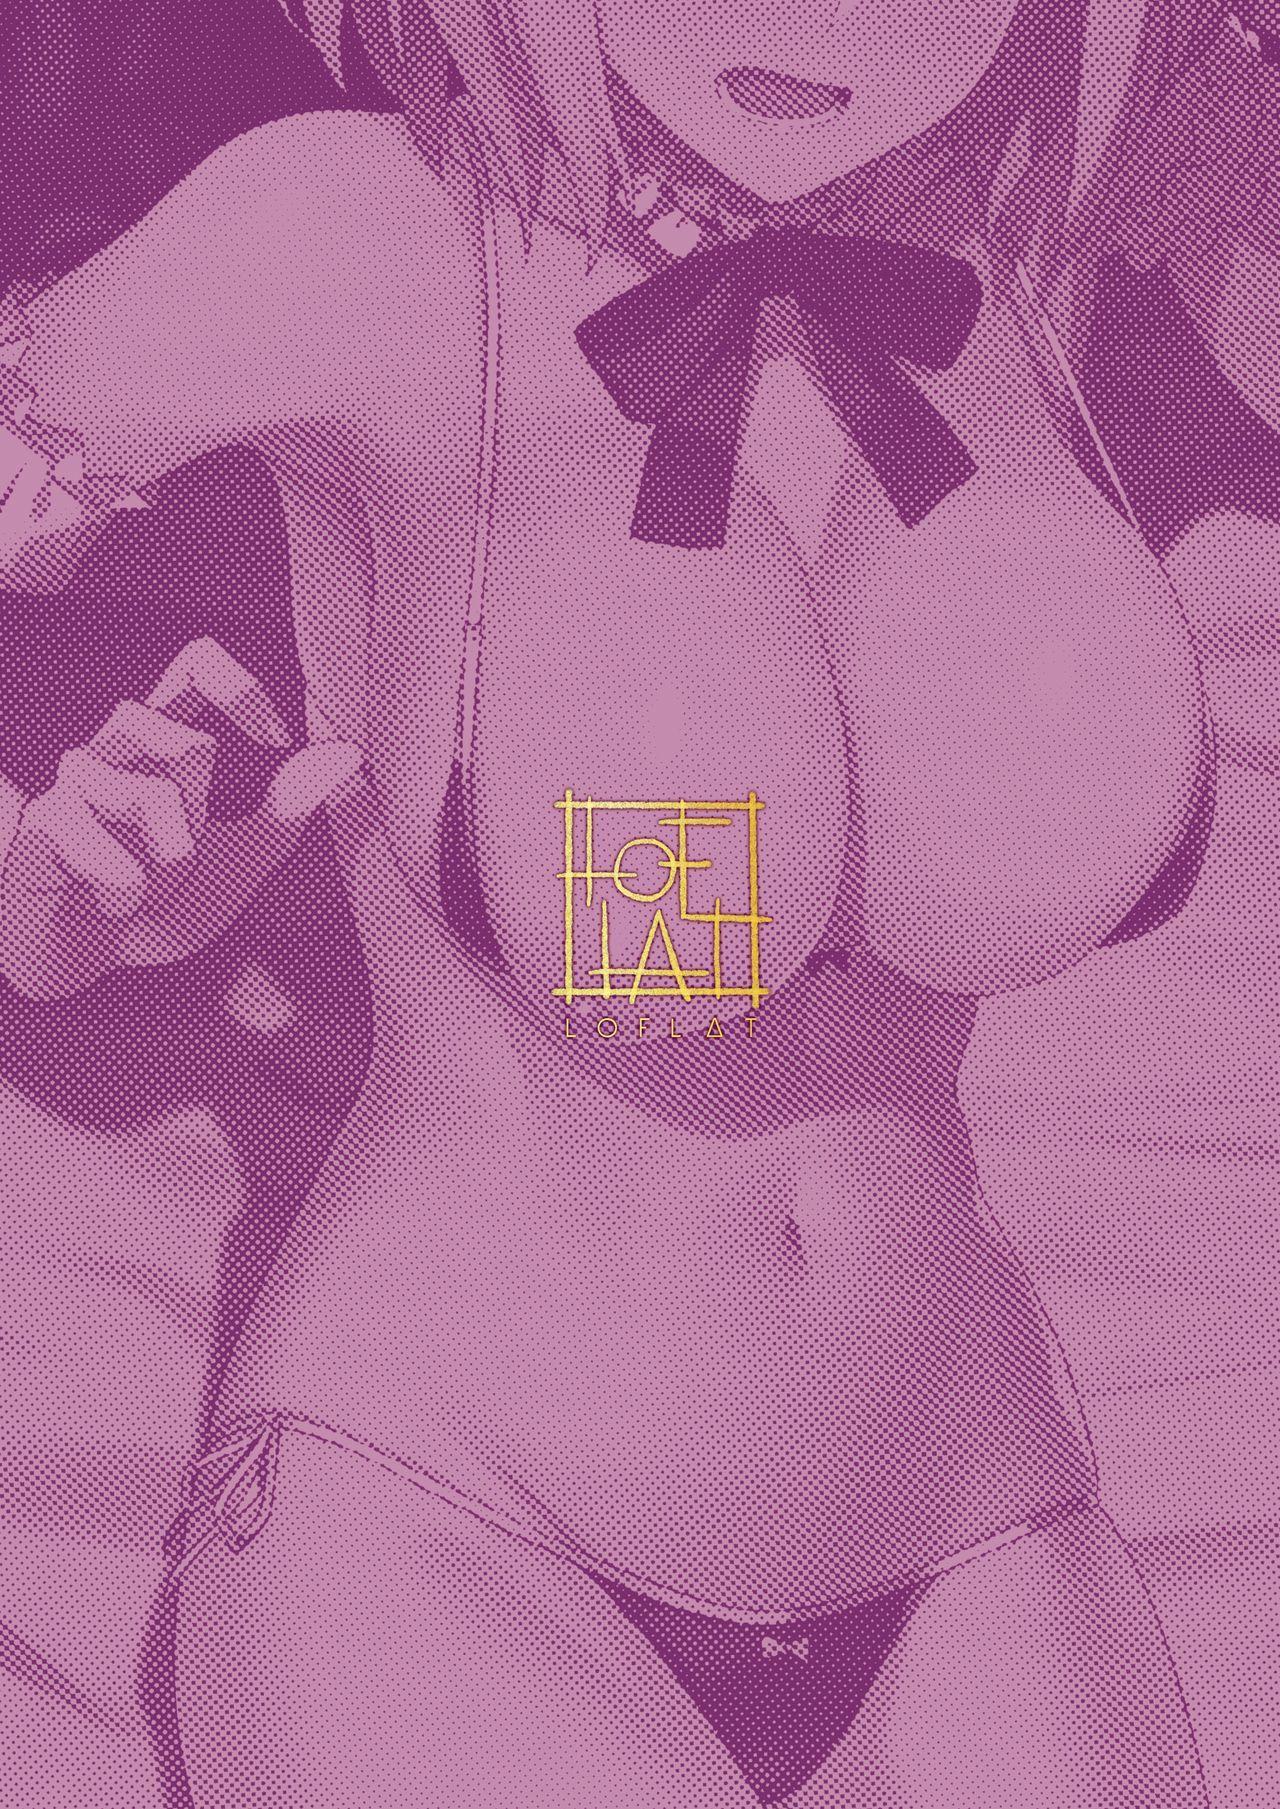 Chaldea Soap 2 Iinari Tsundere Gohoushi Maid | Chaldea Soapland's Premium Maid 2 17